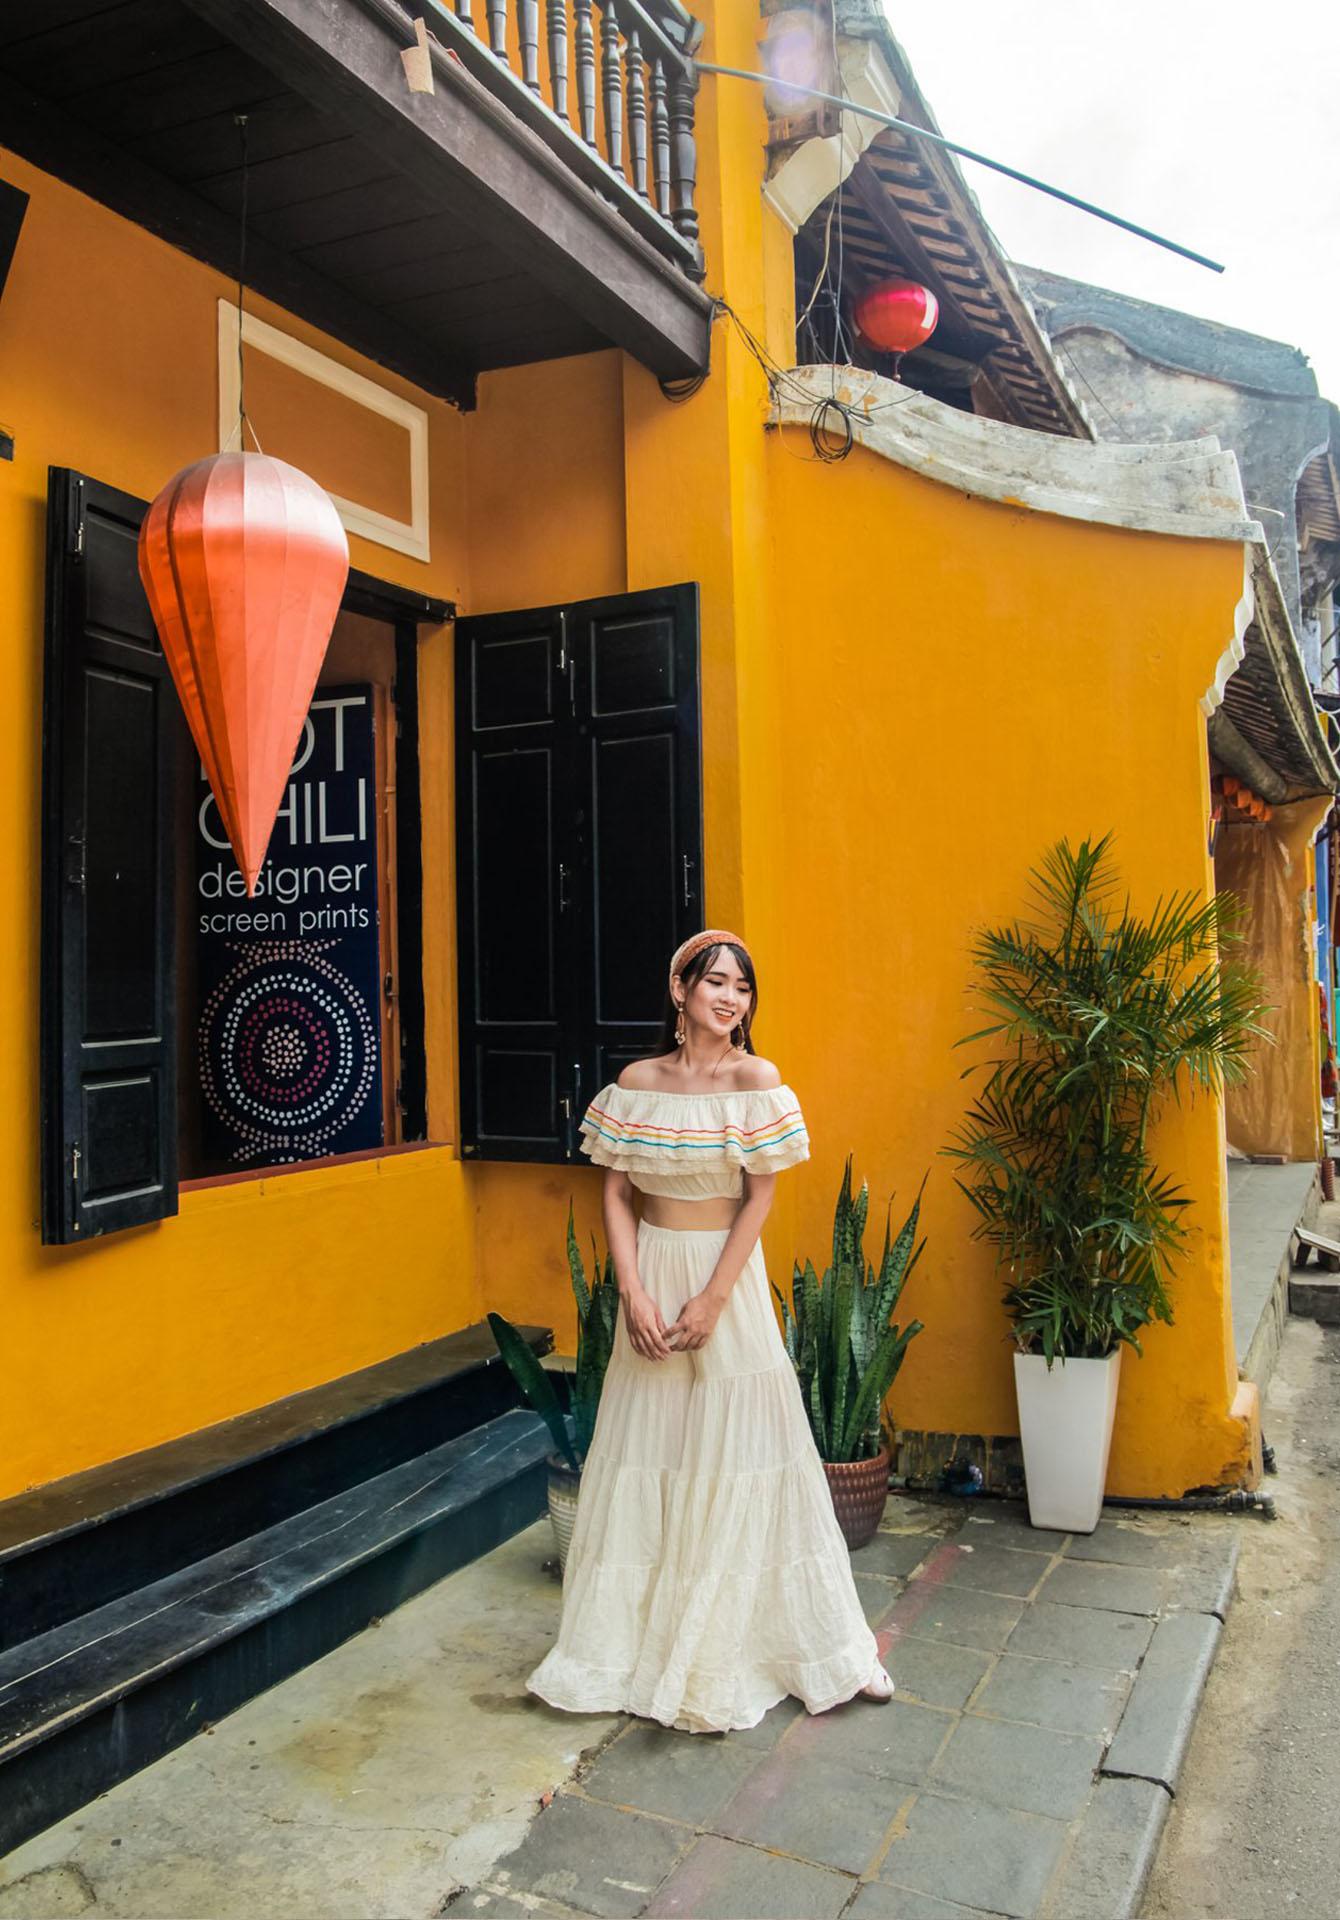 Da Nang Hoi An Nen Tham Quan Cac Dia Diem Vao Thoi Gian Nao Trong Ngay 010